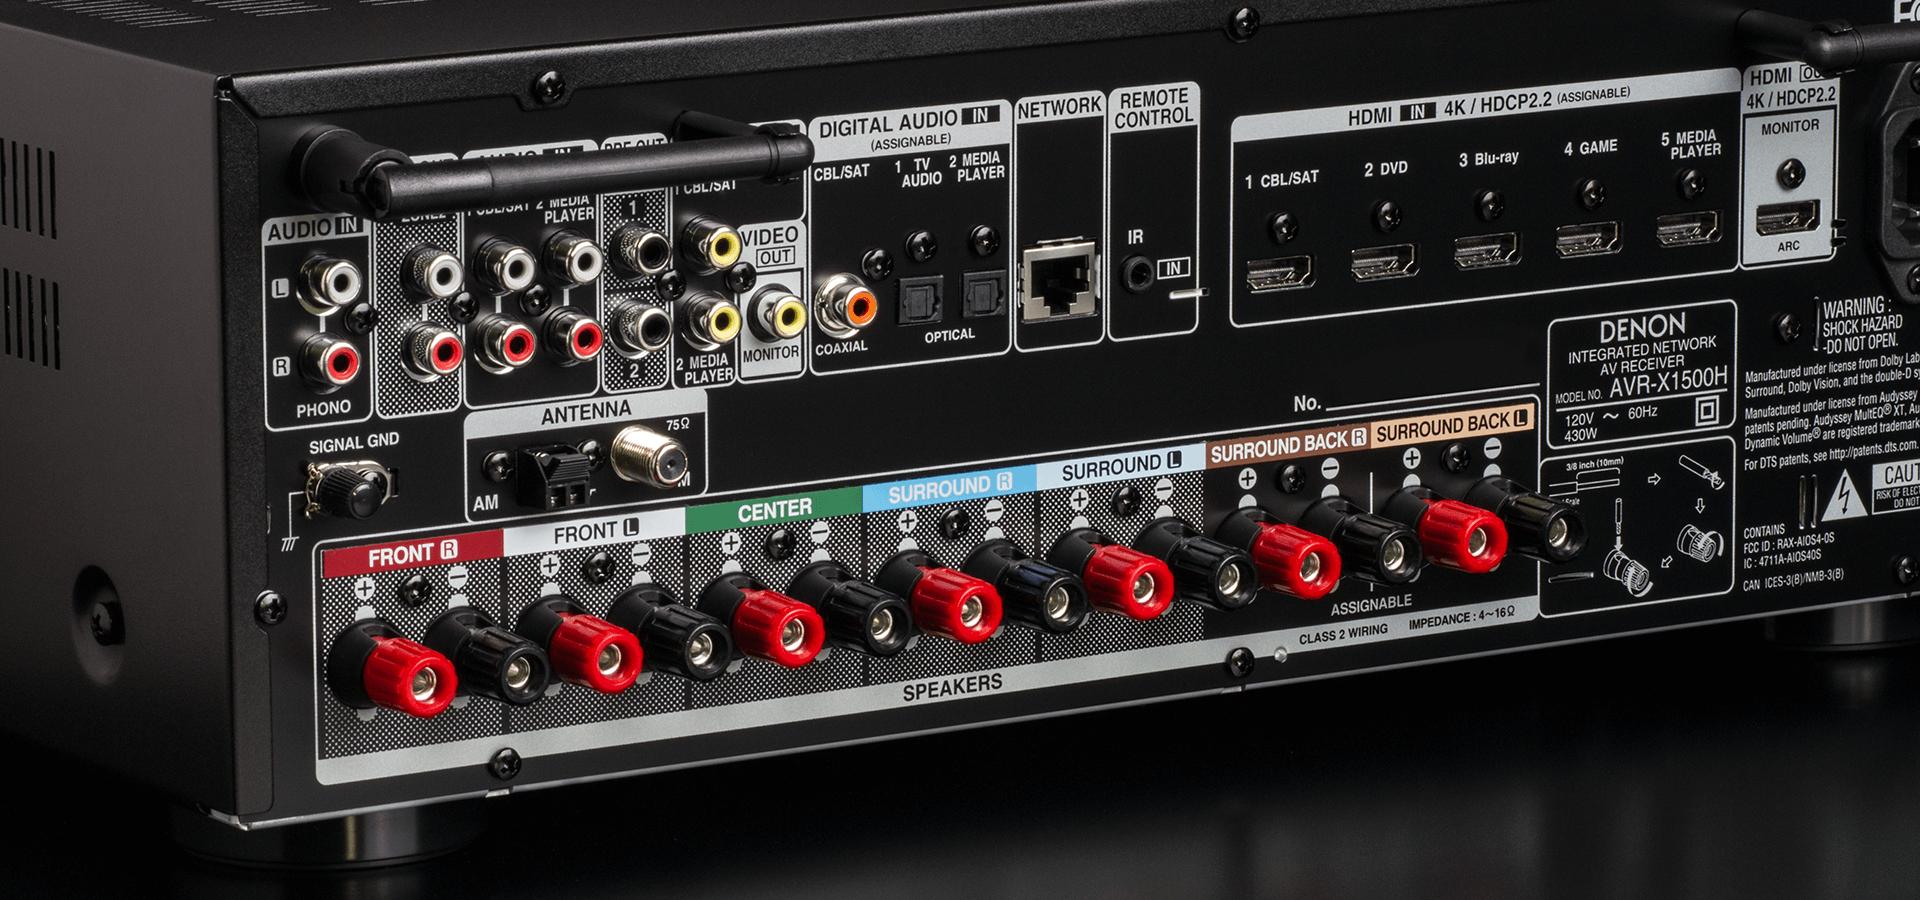 Denon AVR-X1500 H, amplificateur Dolby atmos